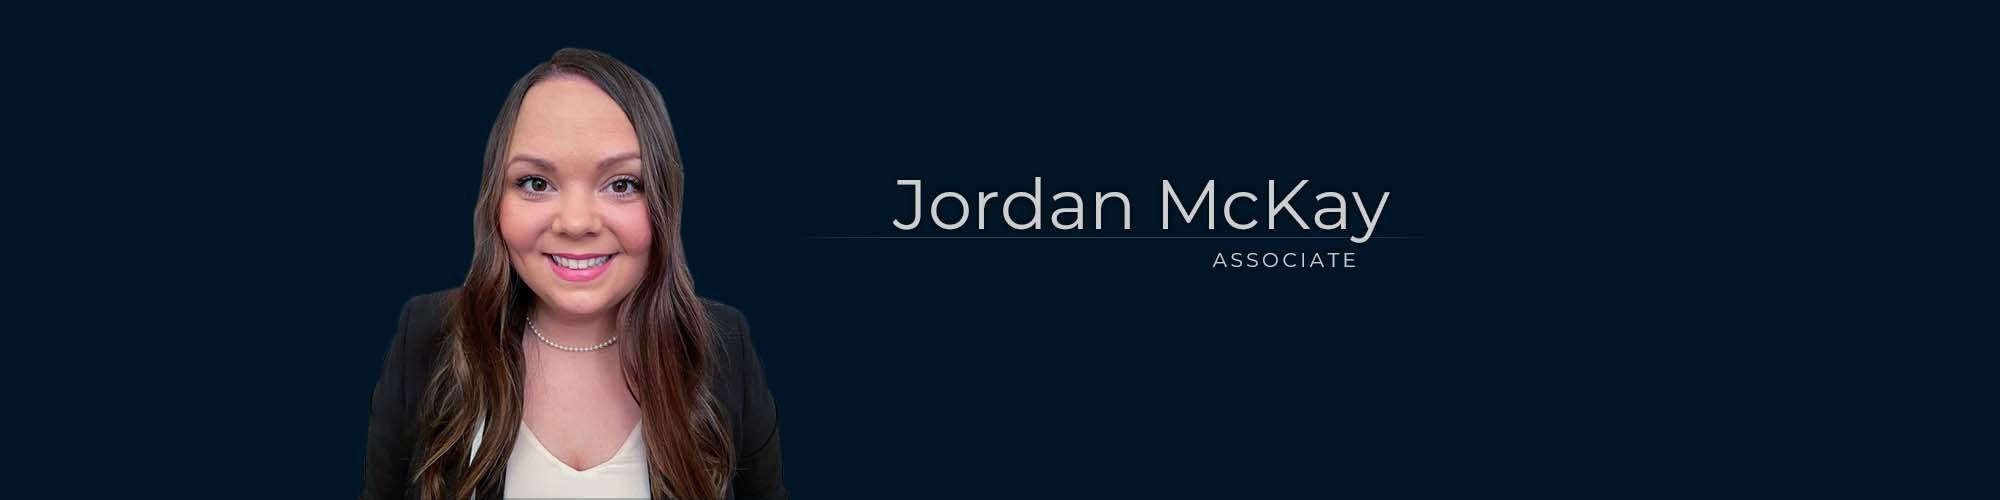 Jordan McKay, Lawyer at Dominion GovLaw LLP